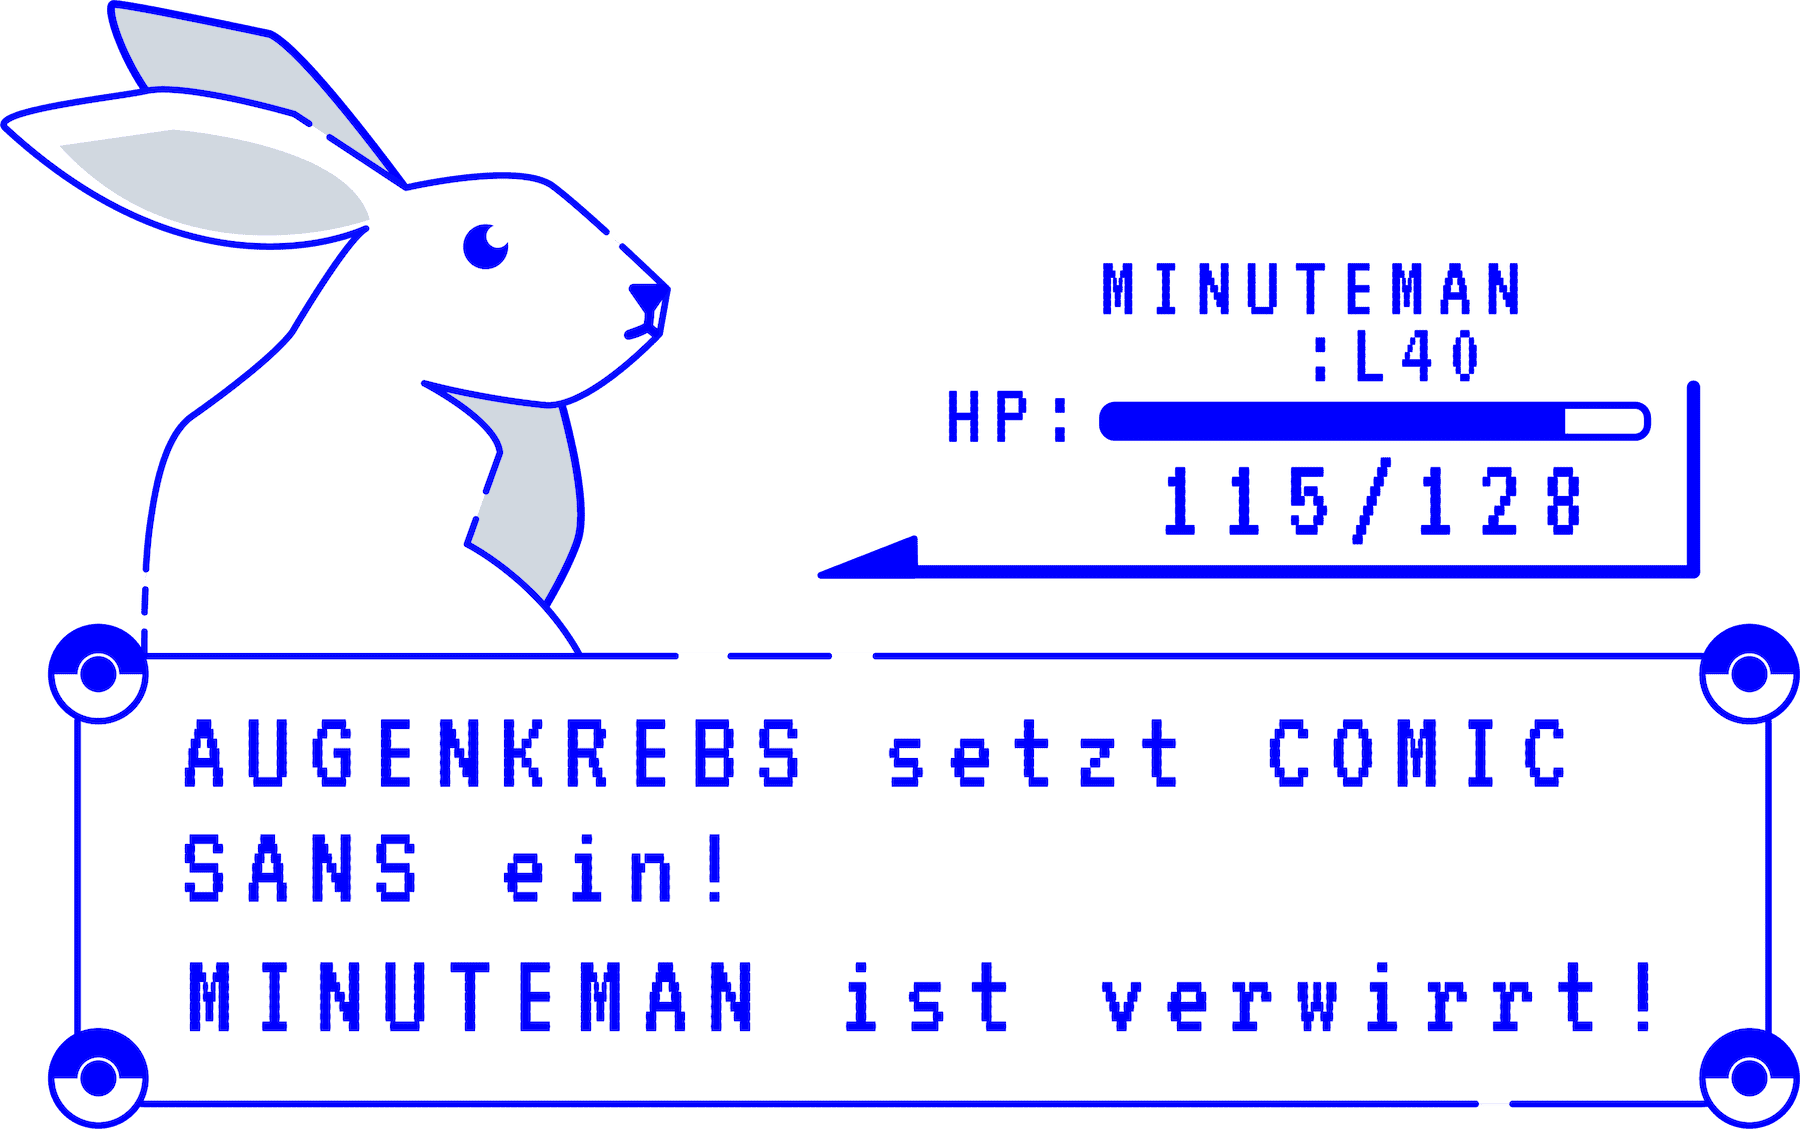 minuteman vs augenkrebs - Computerspiel Kampfszenario - Comic Sans - gutes Design siegt